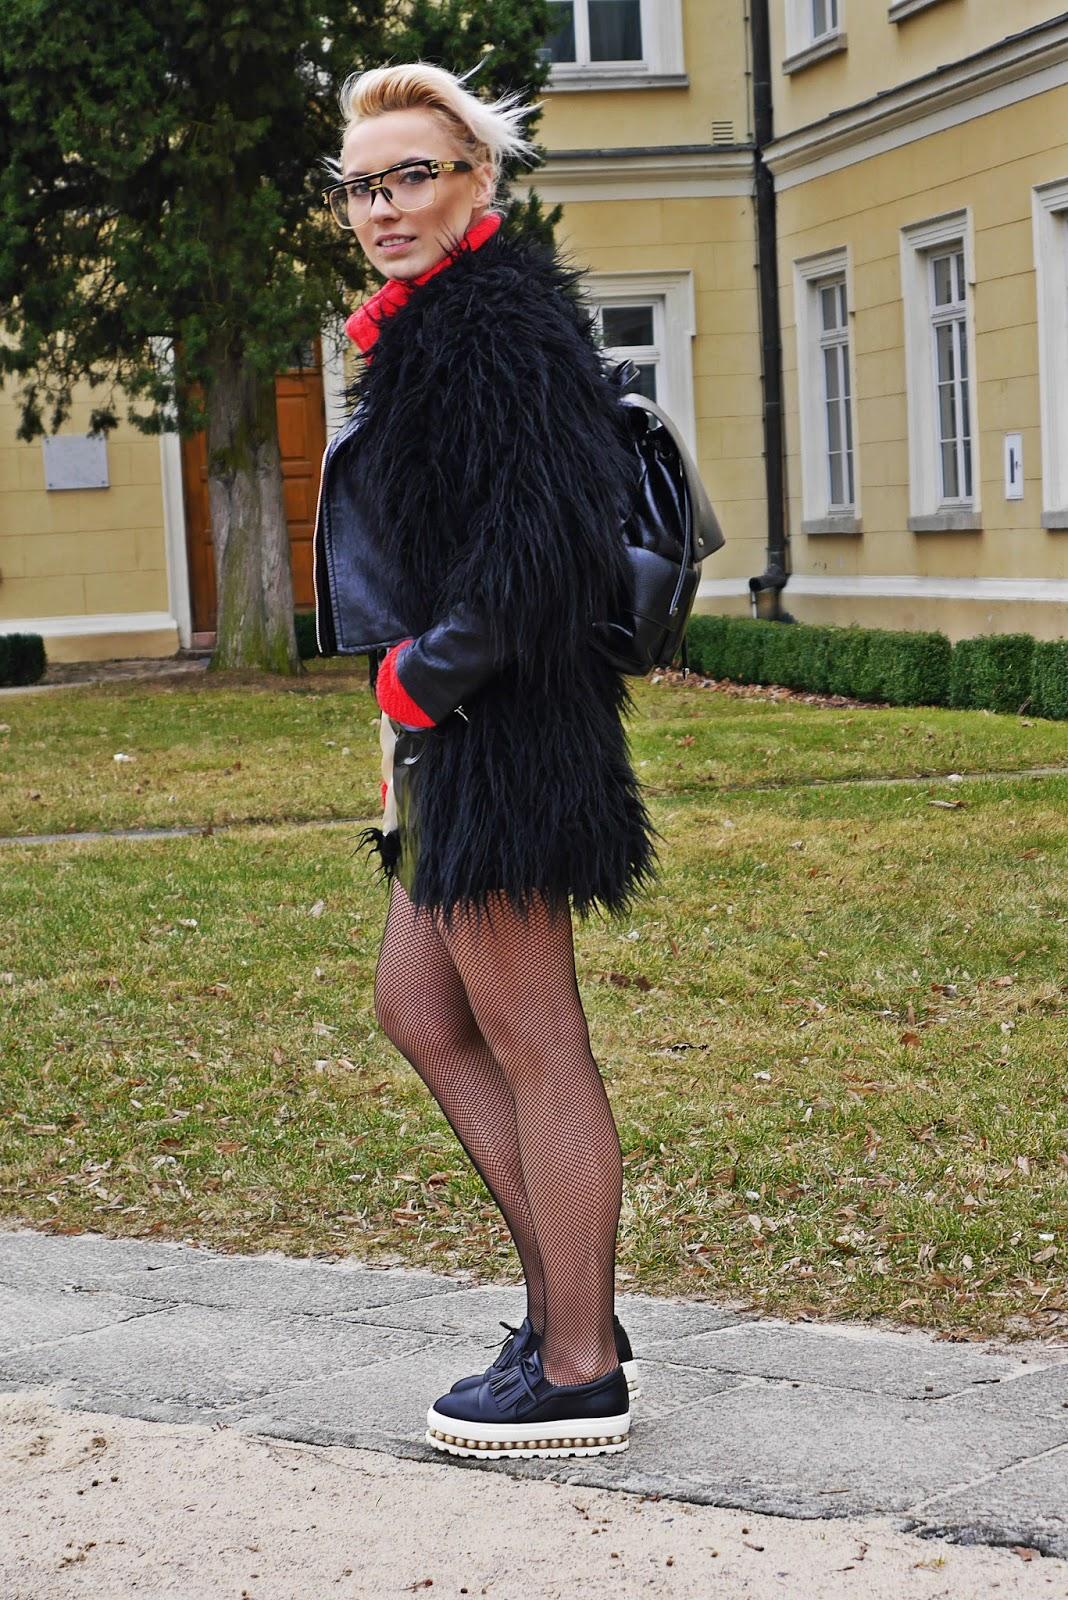 czarne_futerko_spodnica_cerata_look_karyn_blog_160317a